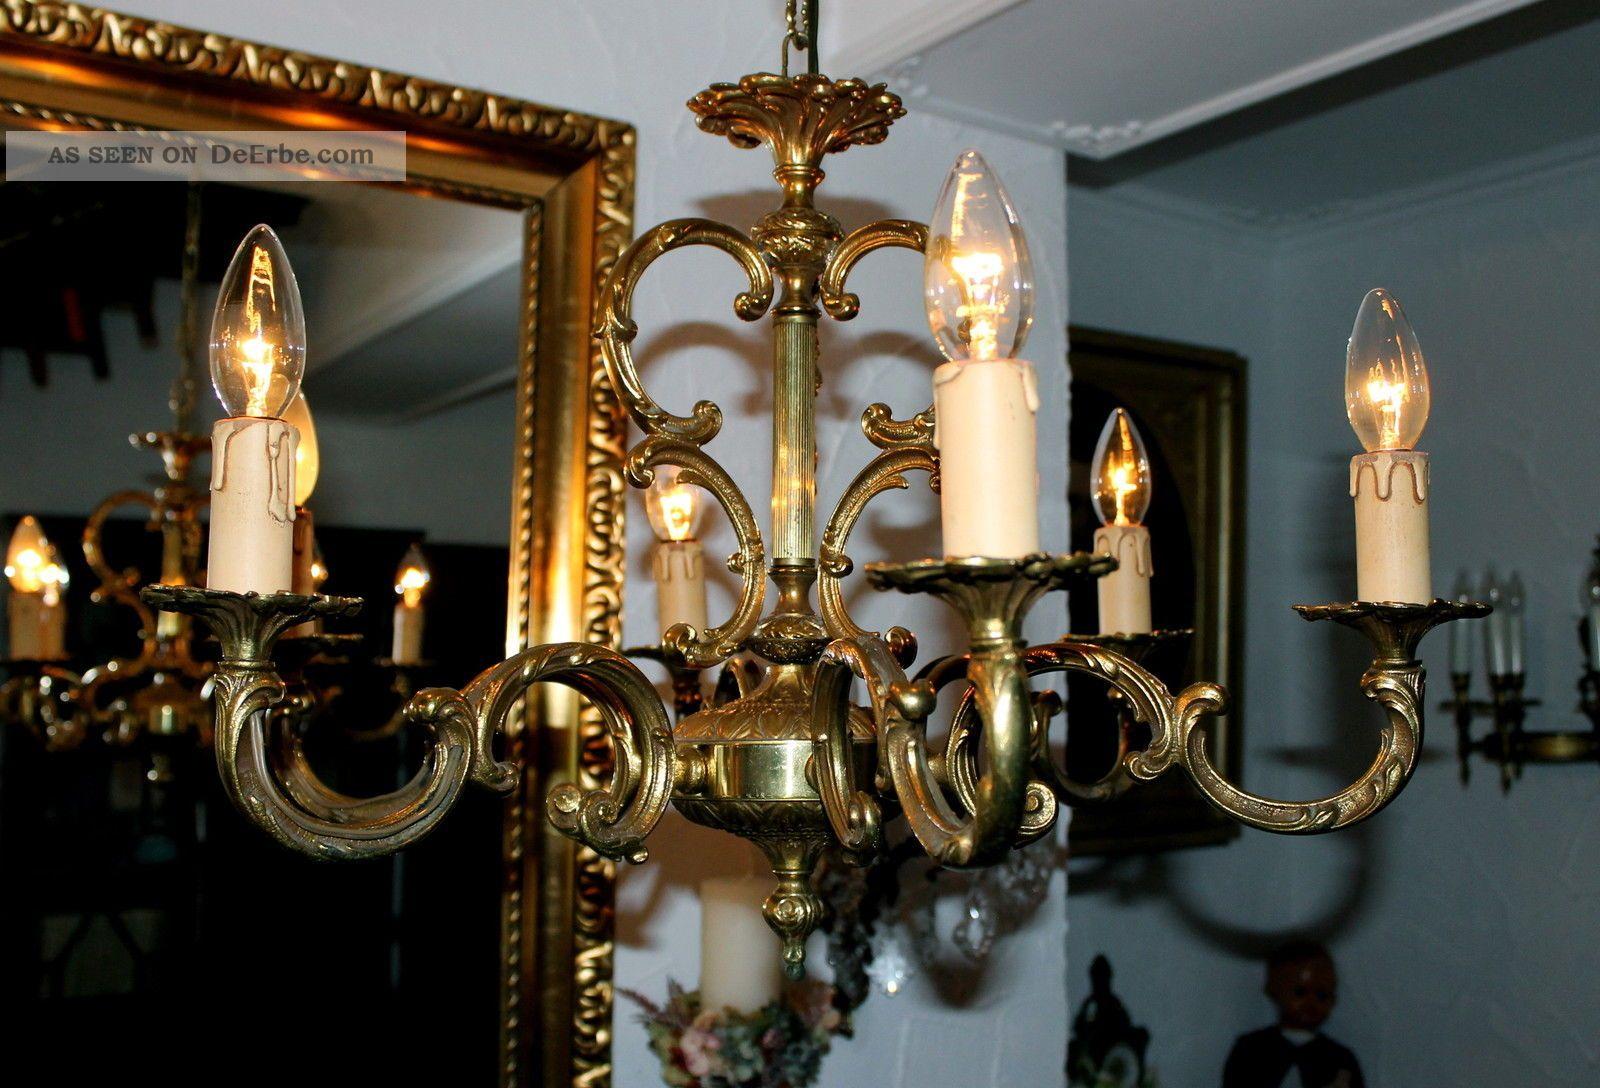 Antike Kronleuchter Frankreich ~ Großer alter antiker kronleuchter chandelier flammig frankreich